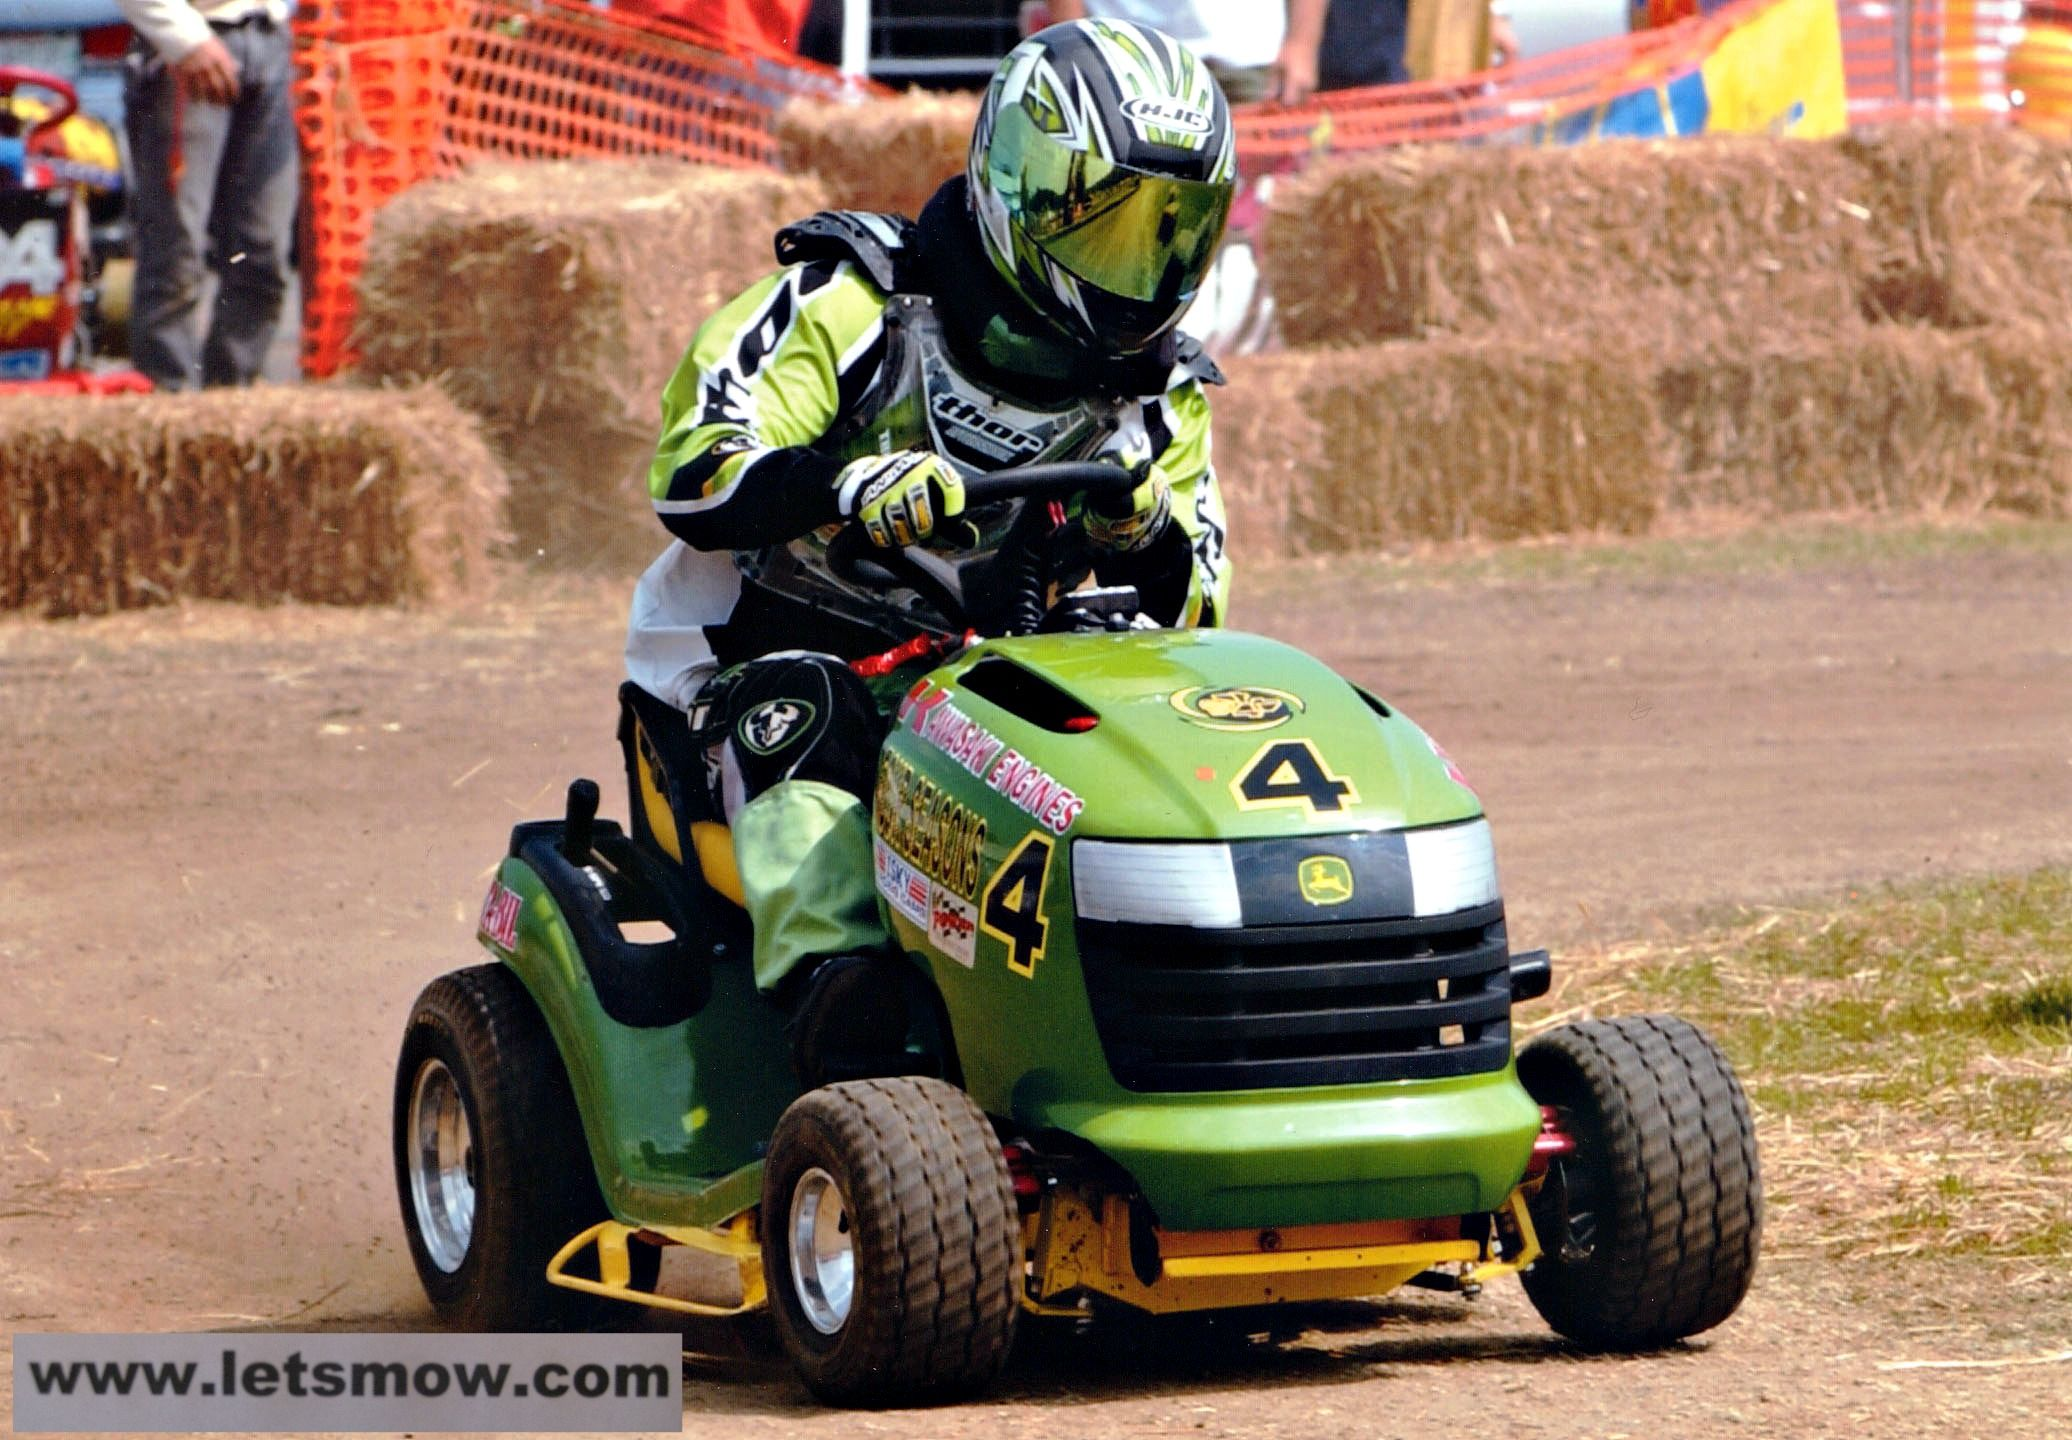 Sta Bil Lawn Mower Racer Jayson Mikula In Action Lawn Mower Racing Tractor Idea Lawn Mower